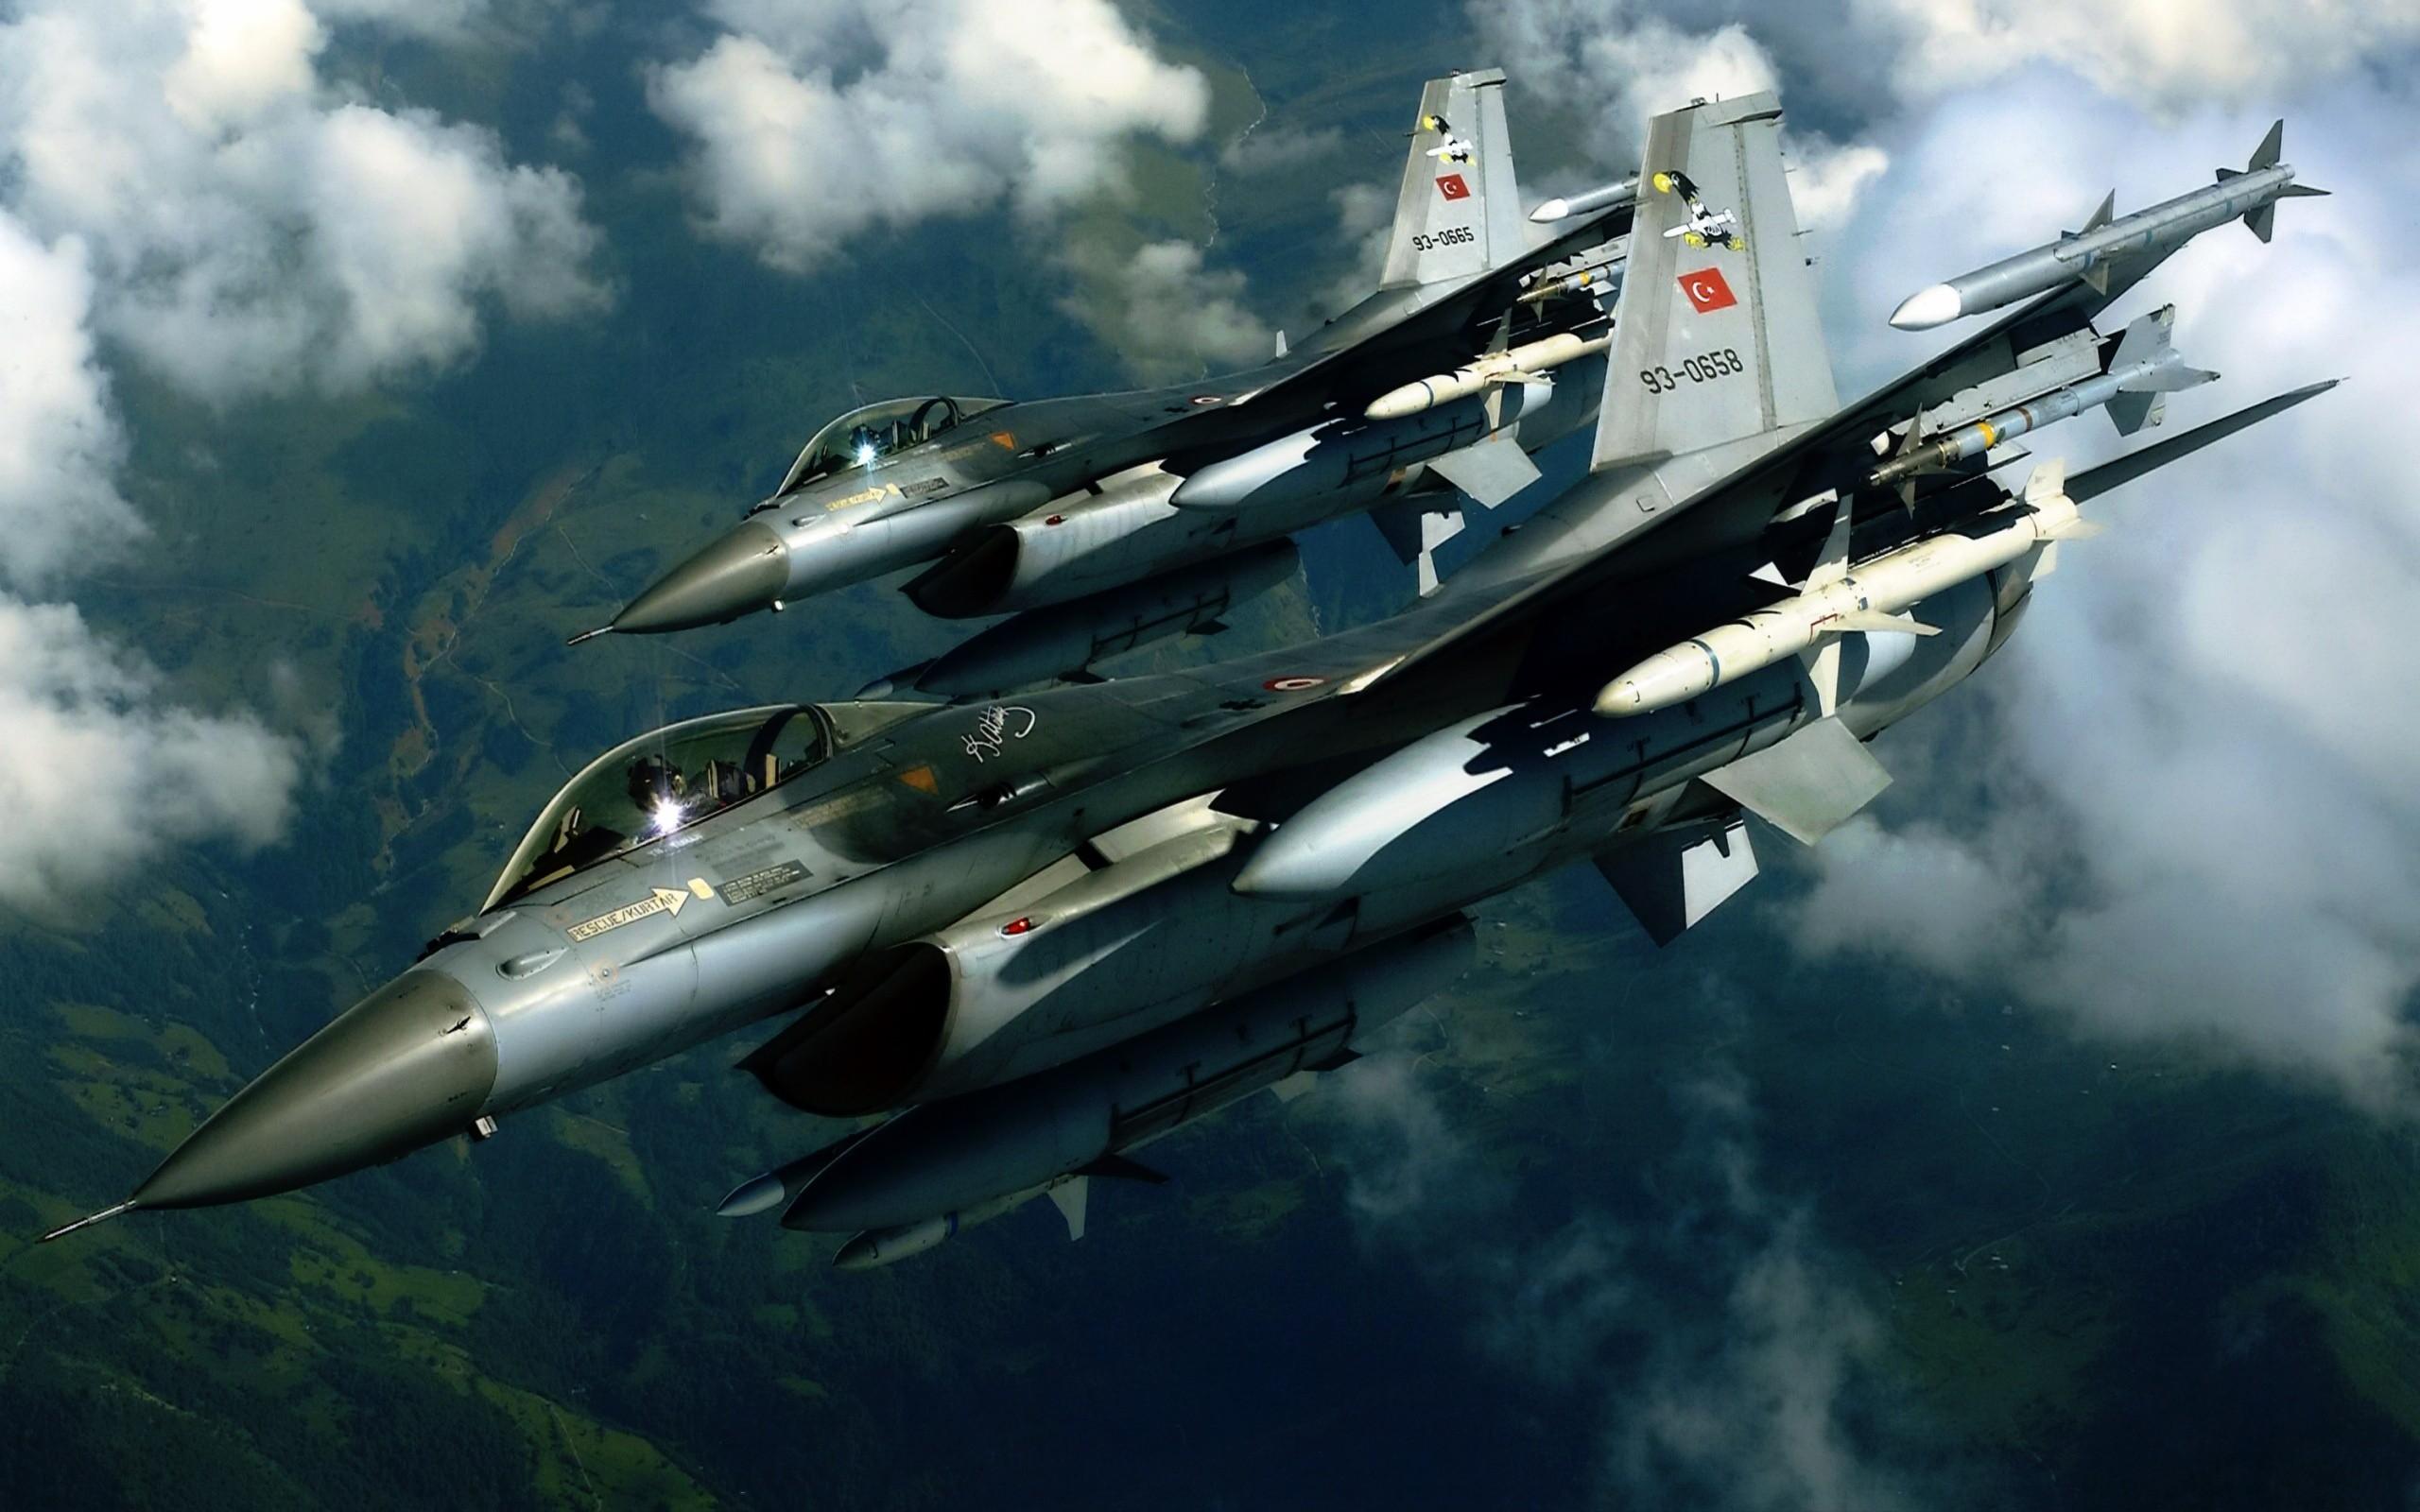 fighter jet desktop background backgrounds iphone definition amazing turkish wide wallpapertag